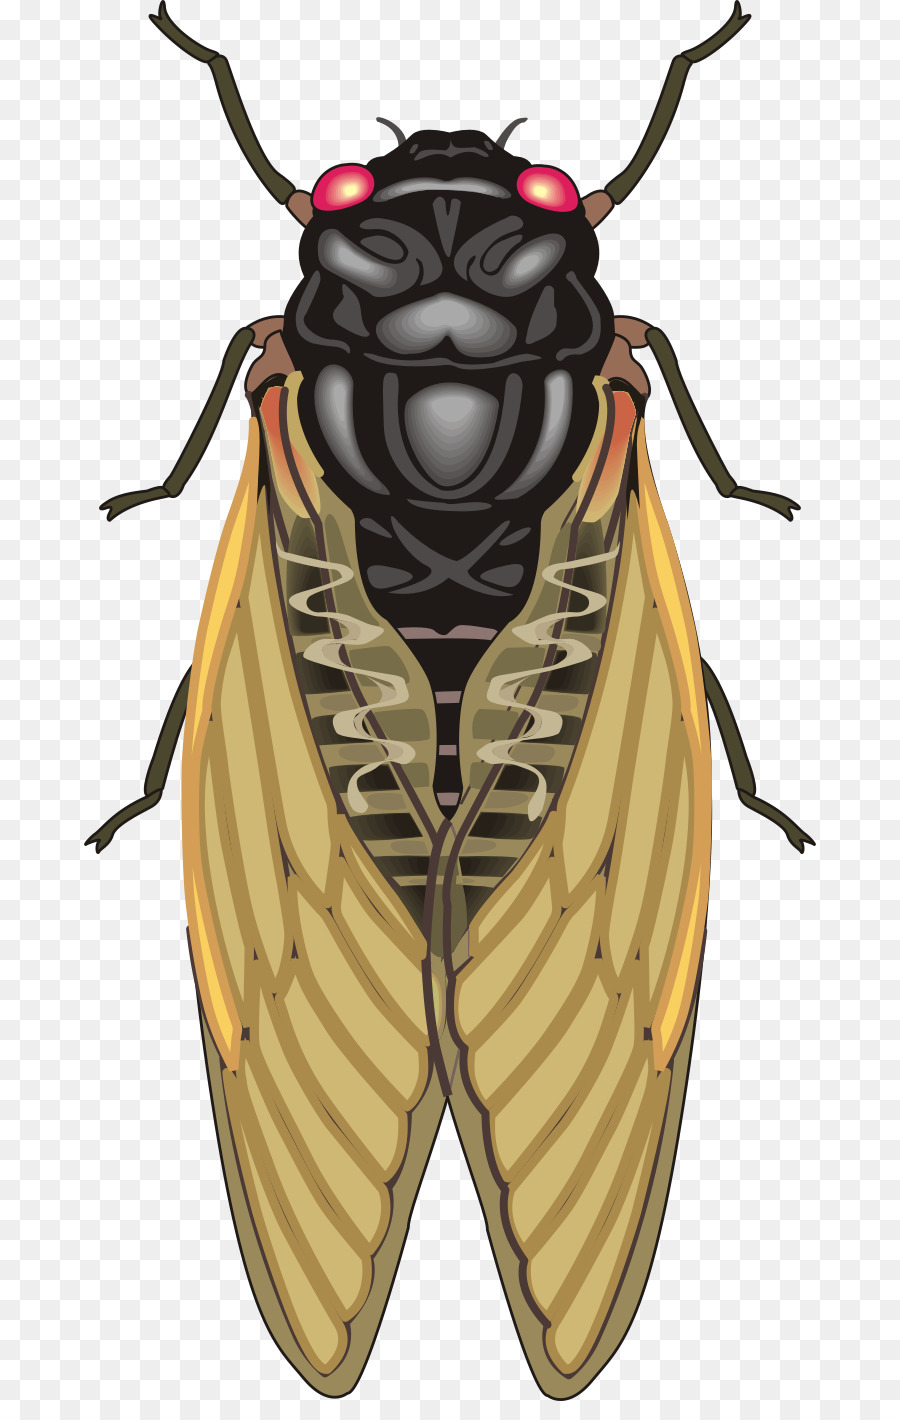 900x1420 Insect Cicadas Clip Art